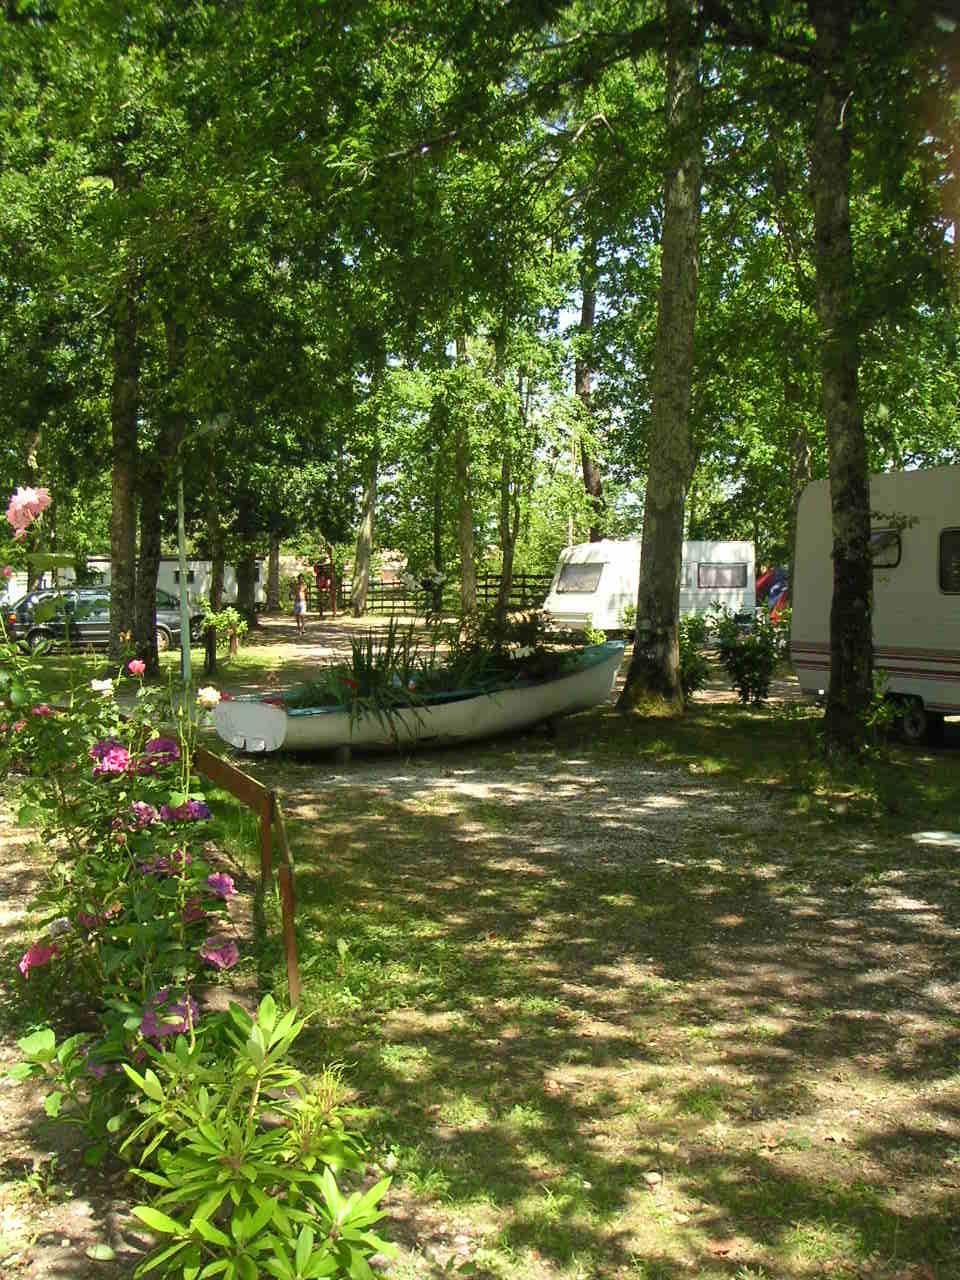 Camping La Praise